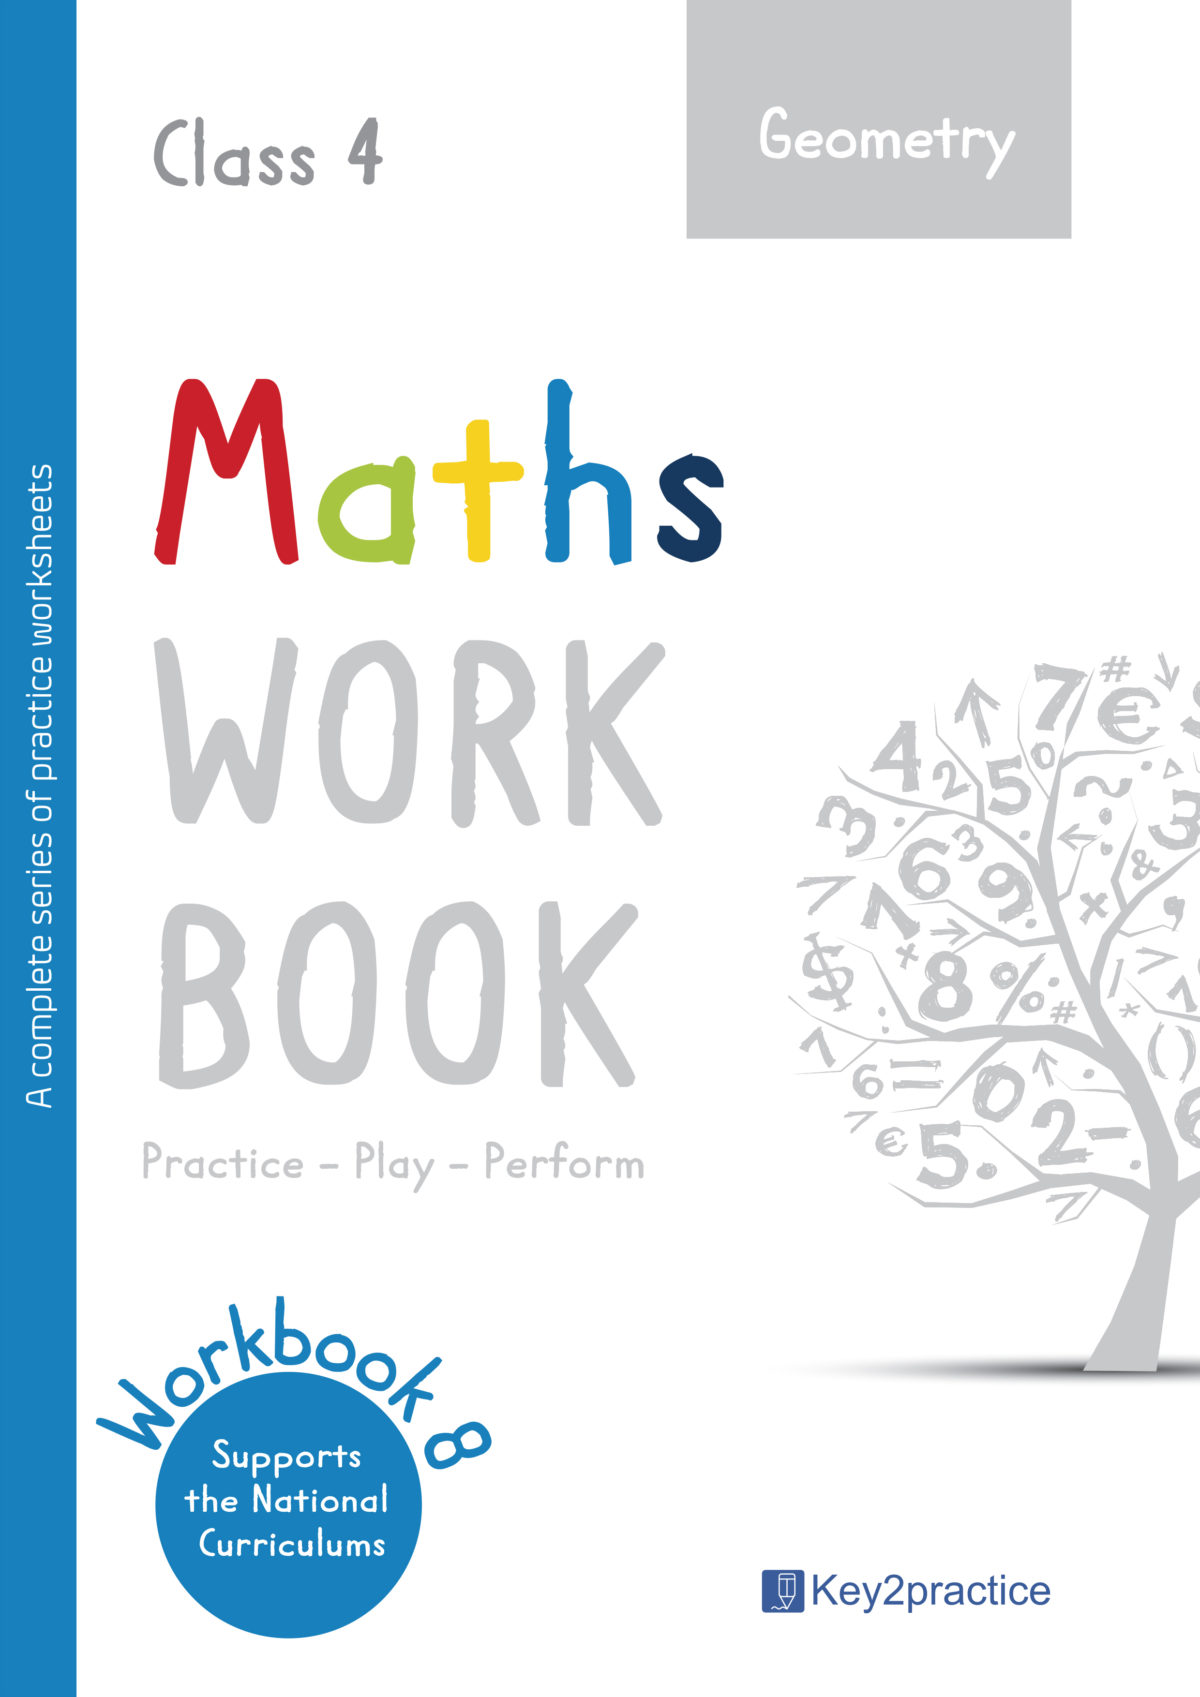 Maths Worksheets Grade 4 Geometry